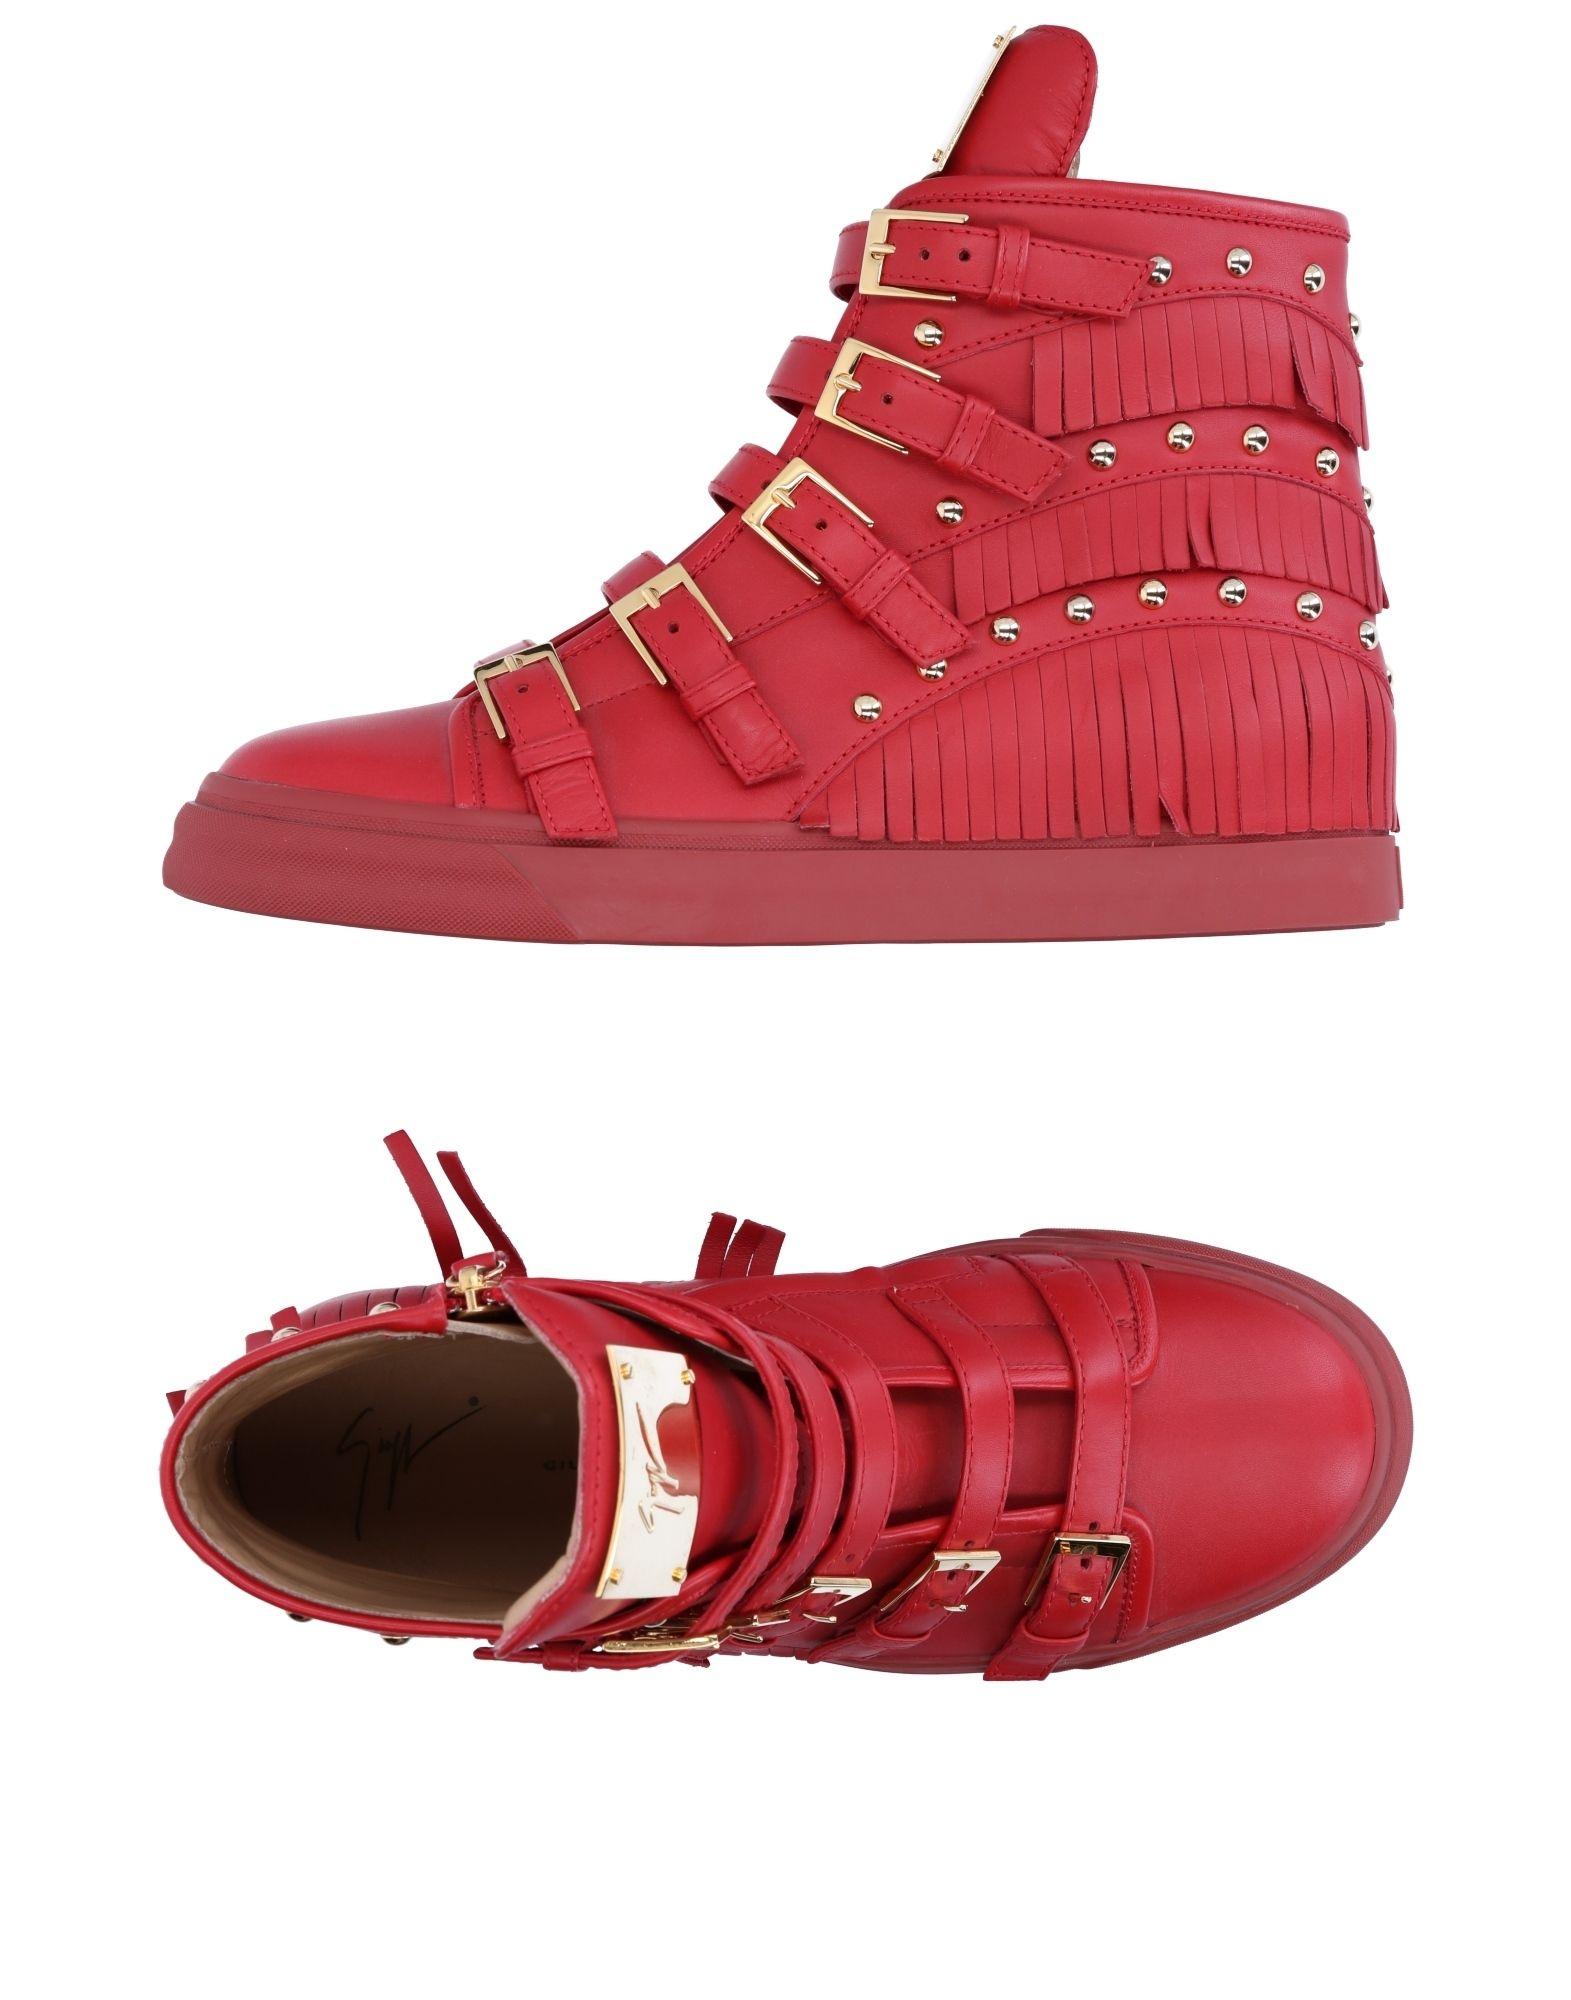 Giuseppe Zanotti gut Sneakers Damen  11265985DUGünstige gut Zanotti aussehende Schuhe 4aceb8